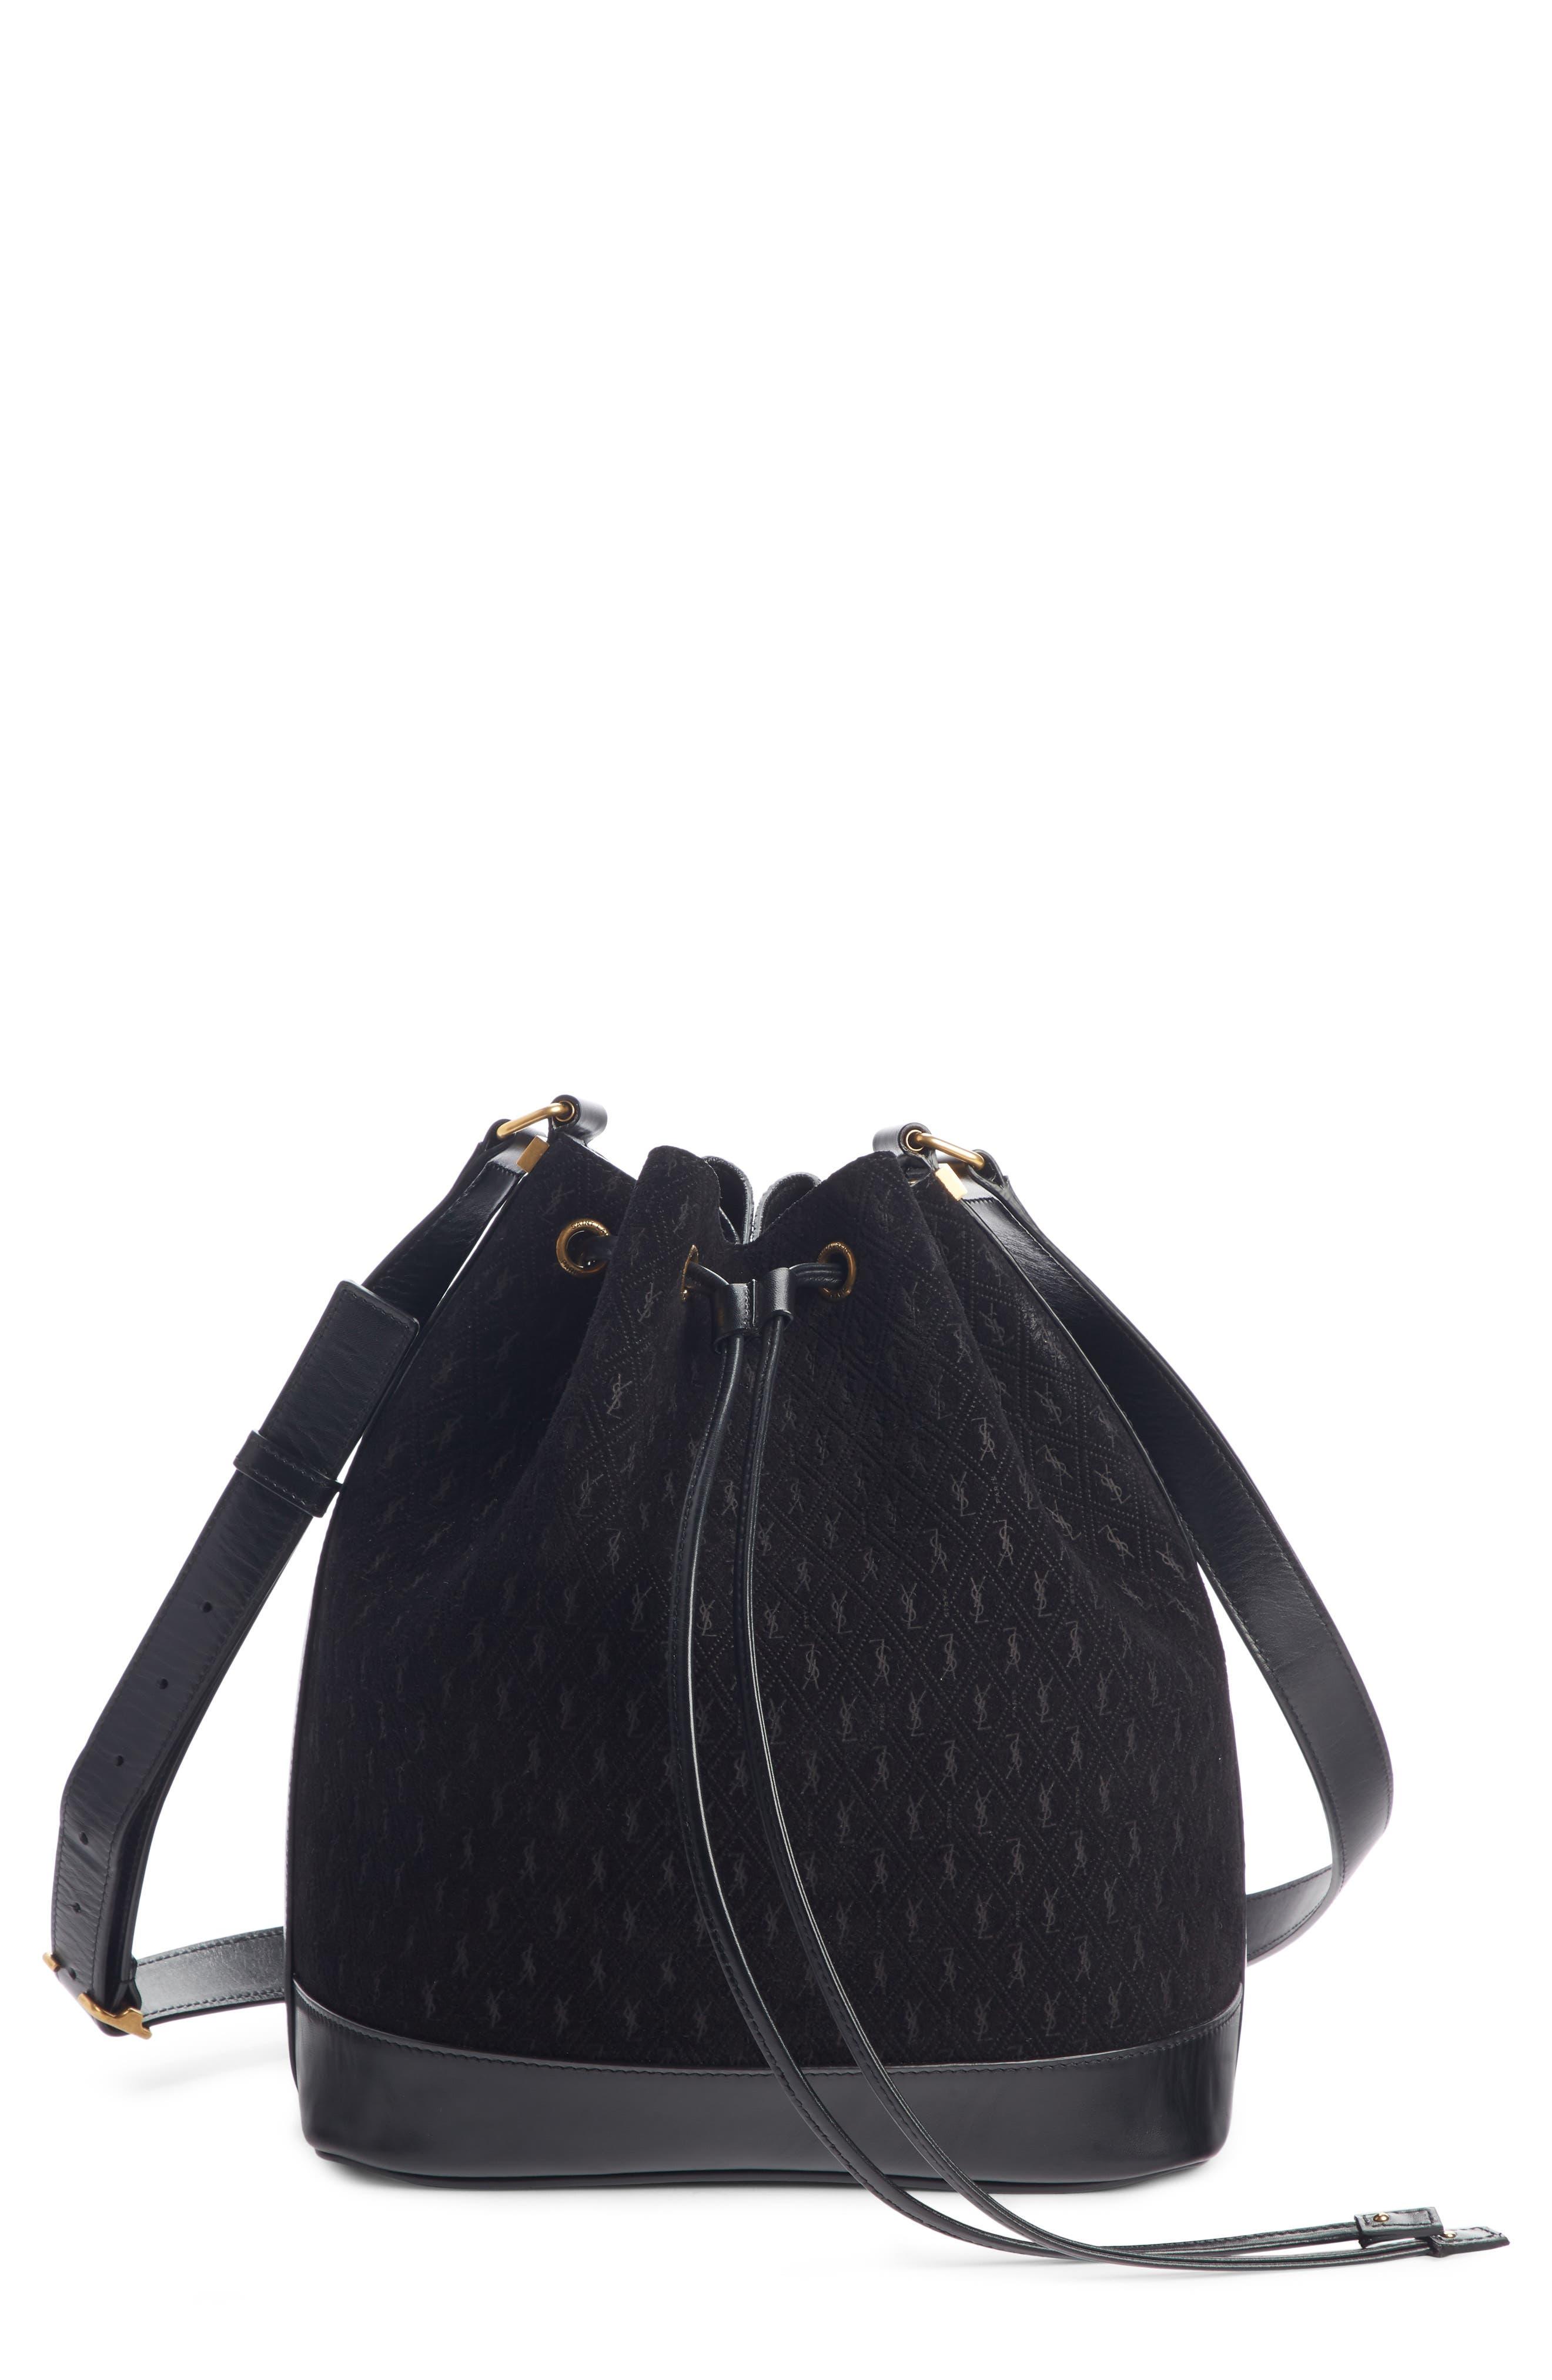 Monogramme Calfskin Suede Bucket Bag, Main, color, NOIR/ NOIR